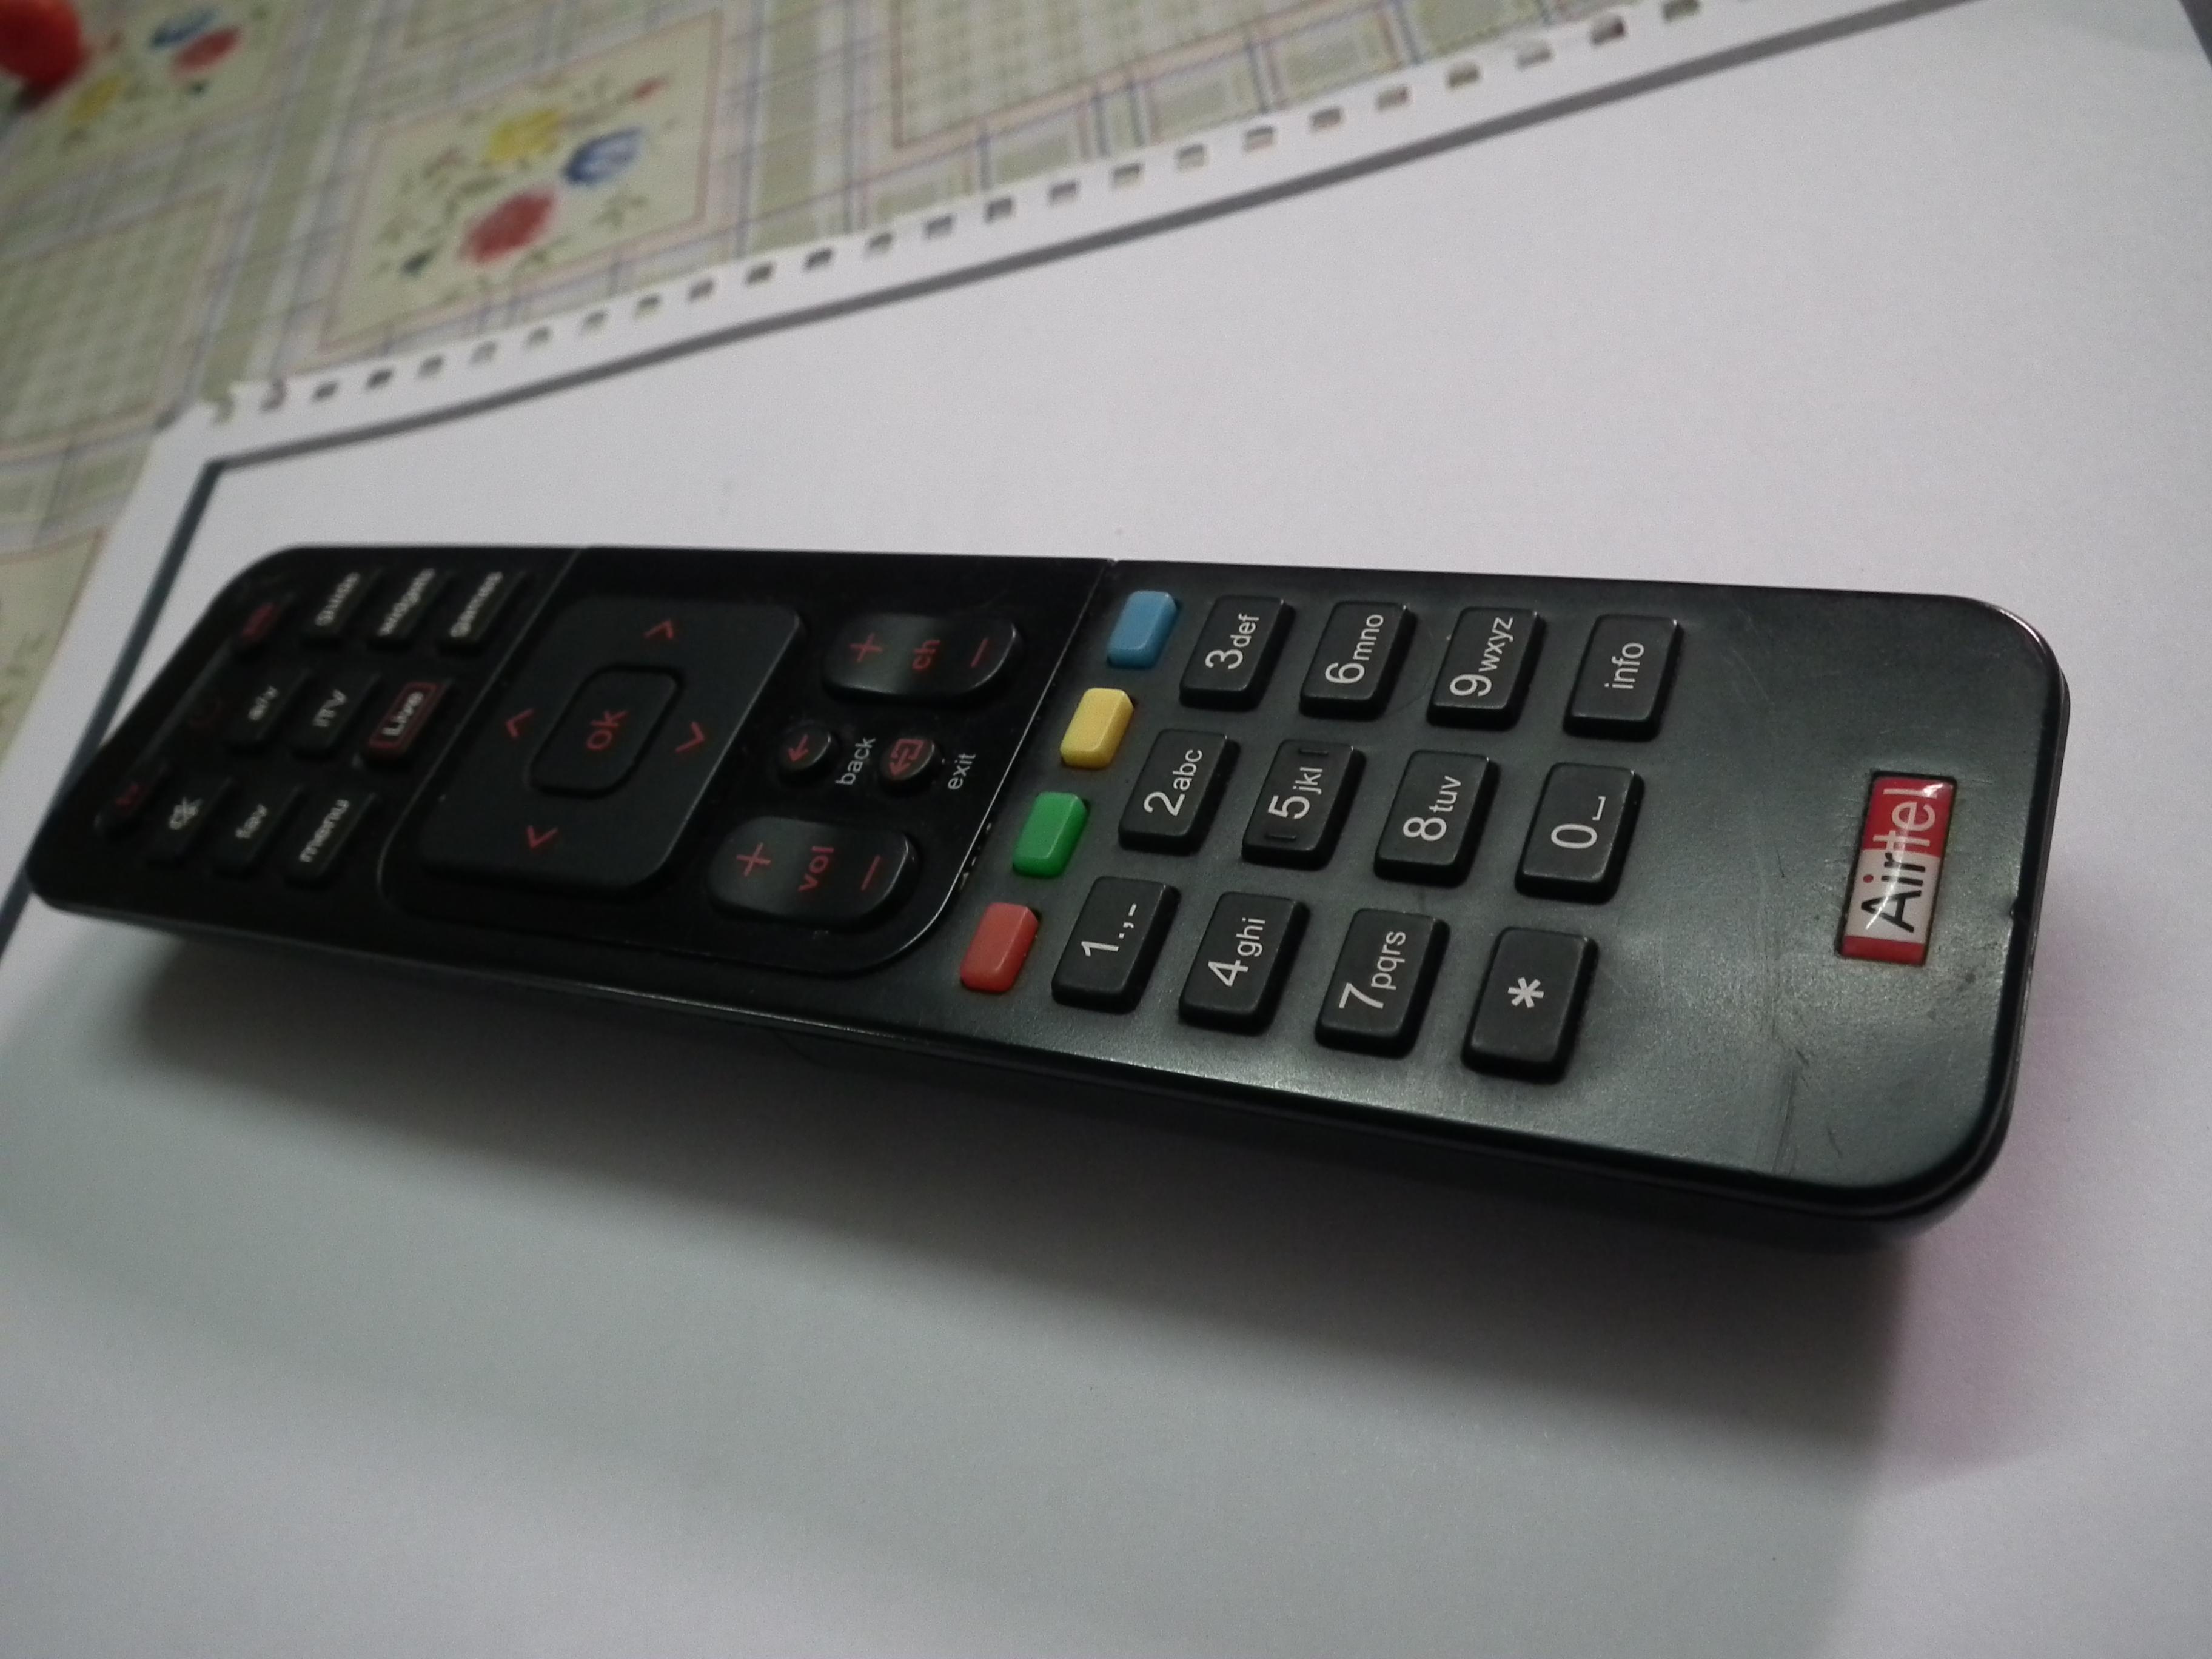 Image Result For Airtel Digital Tv